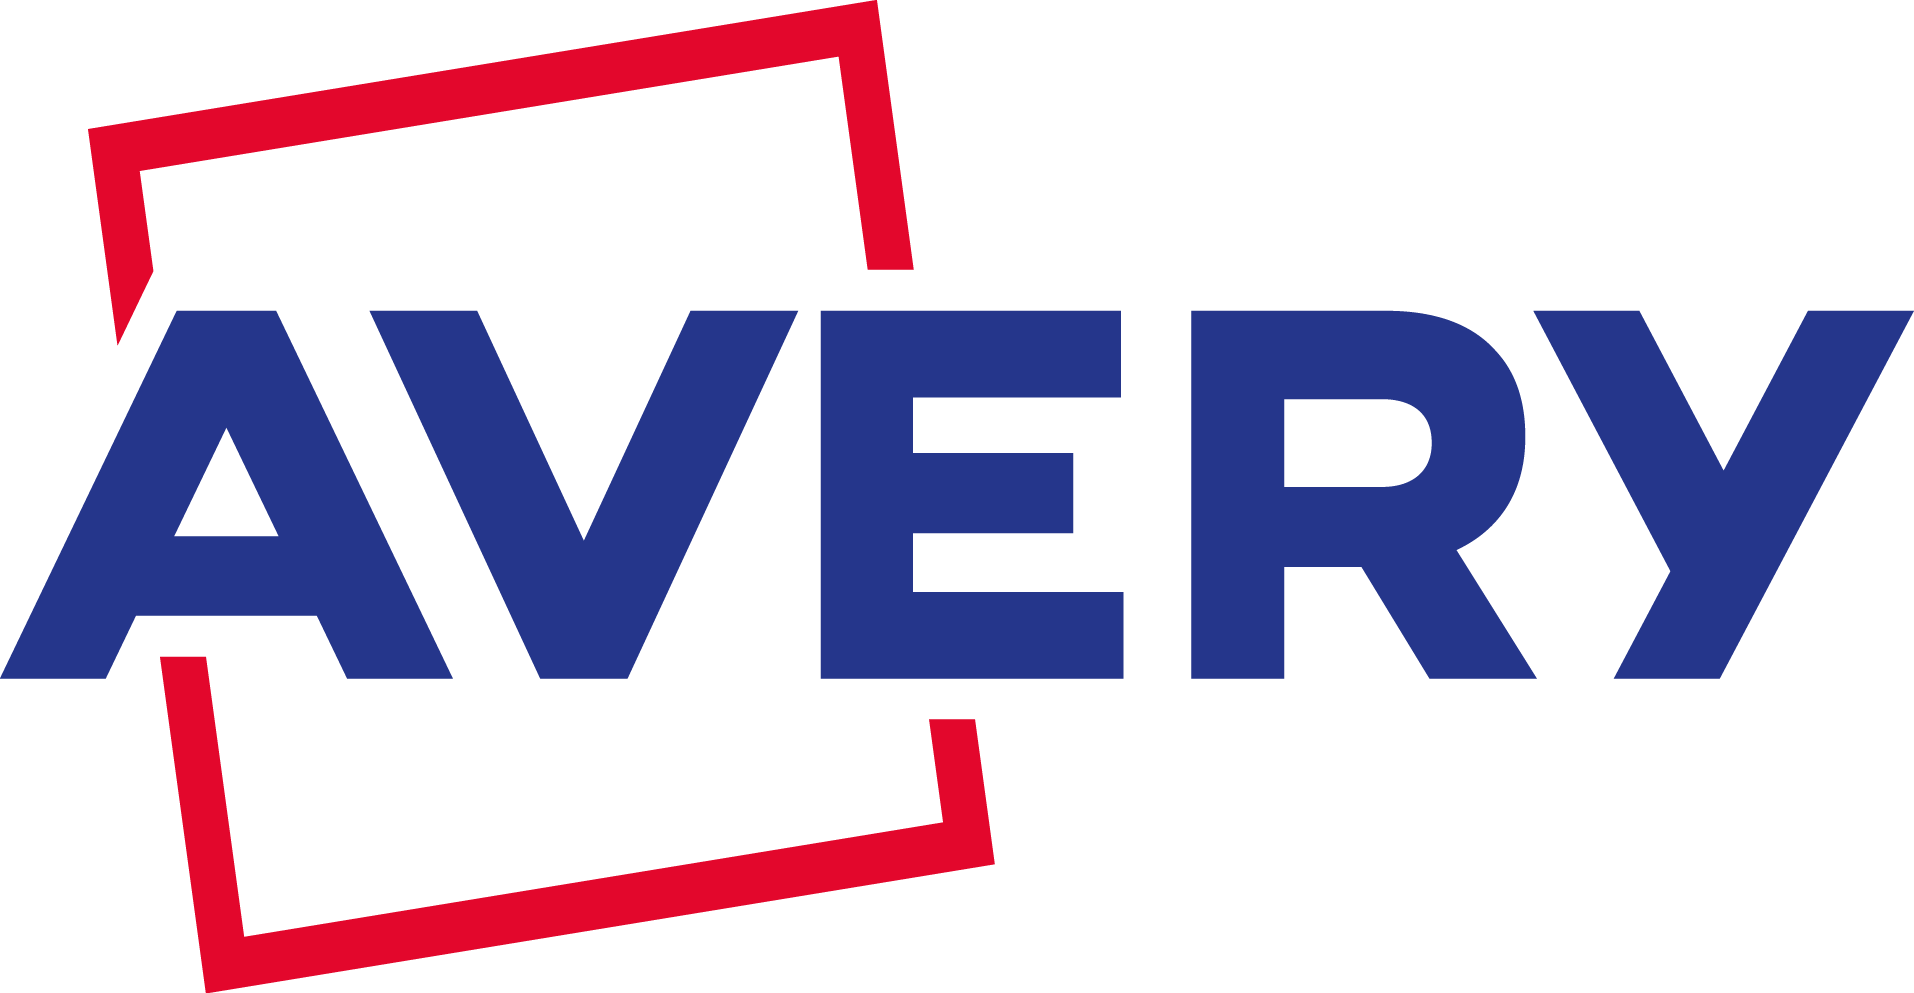 Avery Logo png